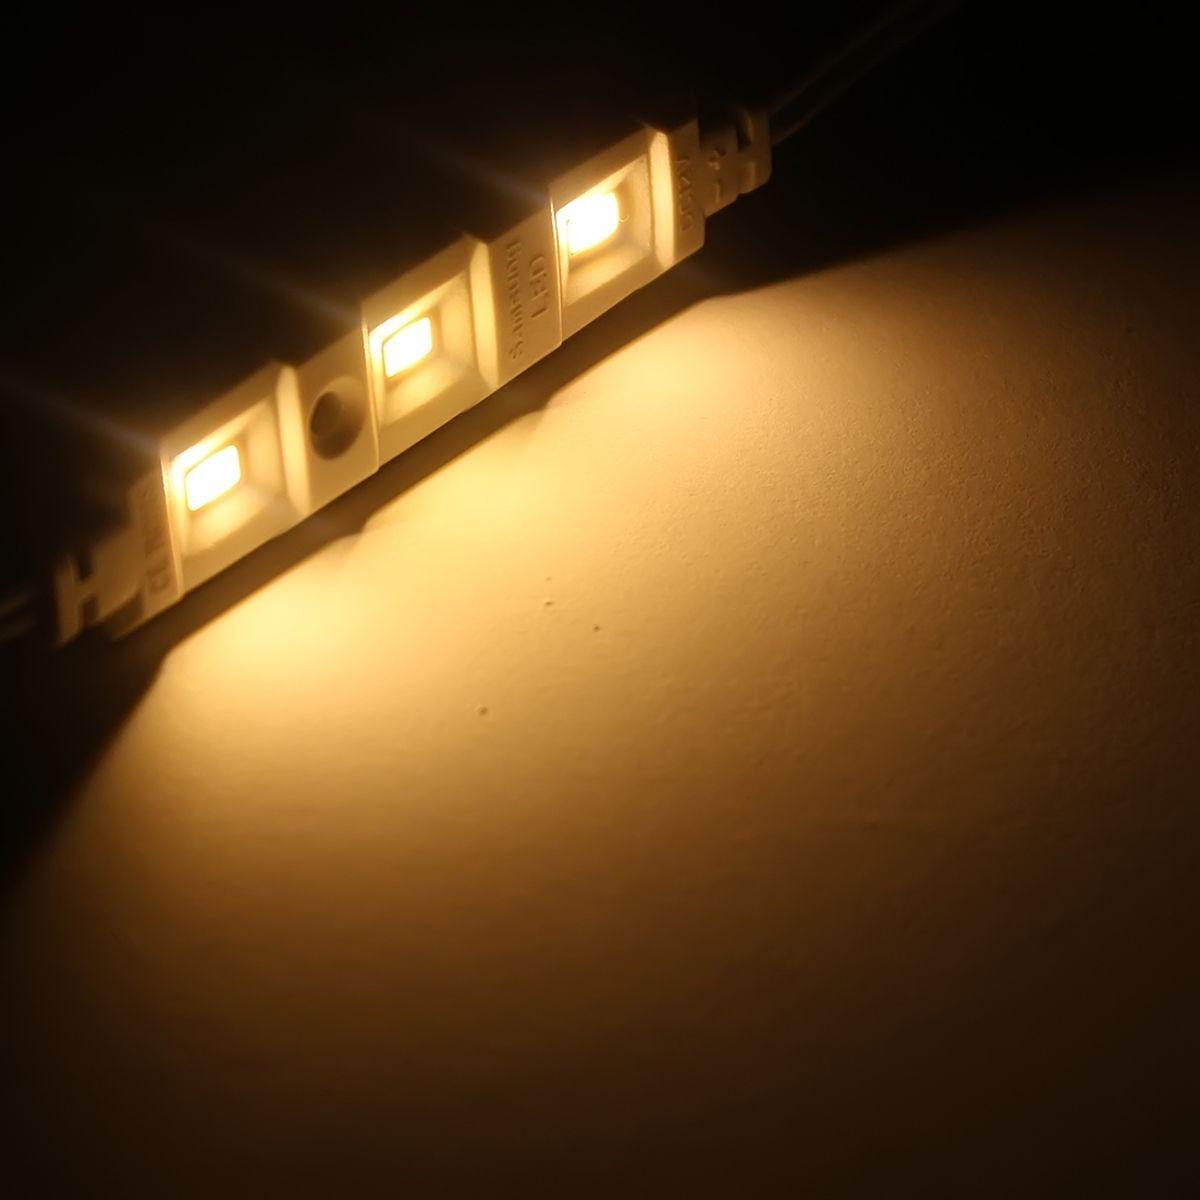 12V wasserfestes LED Modul – warmweiß – IP65